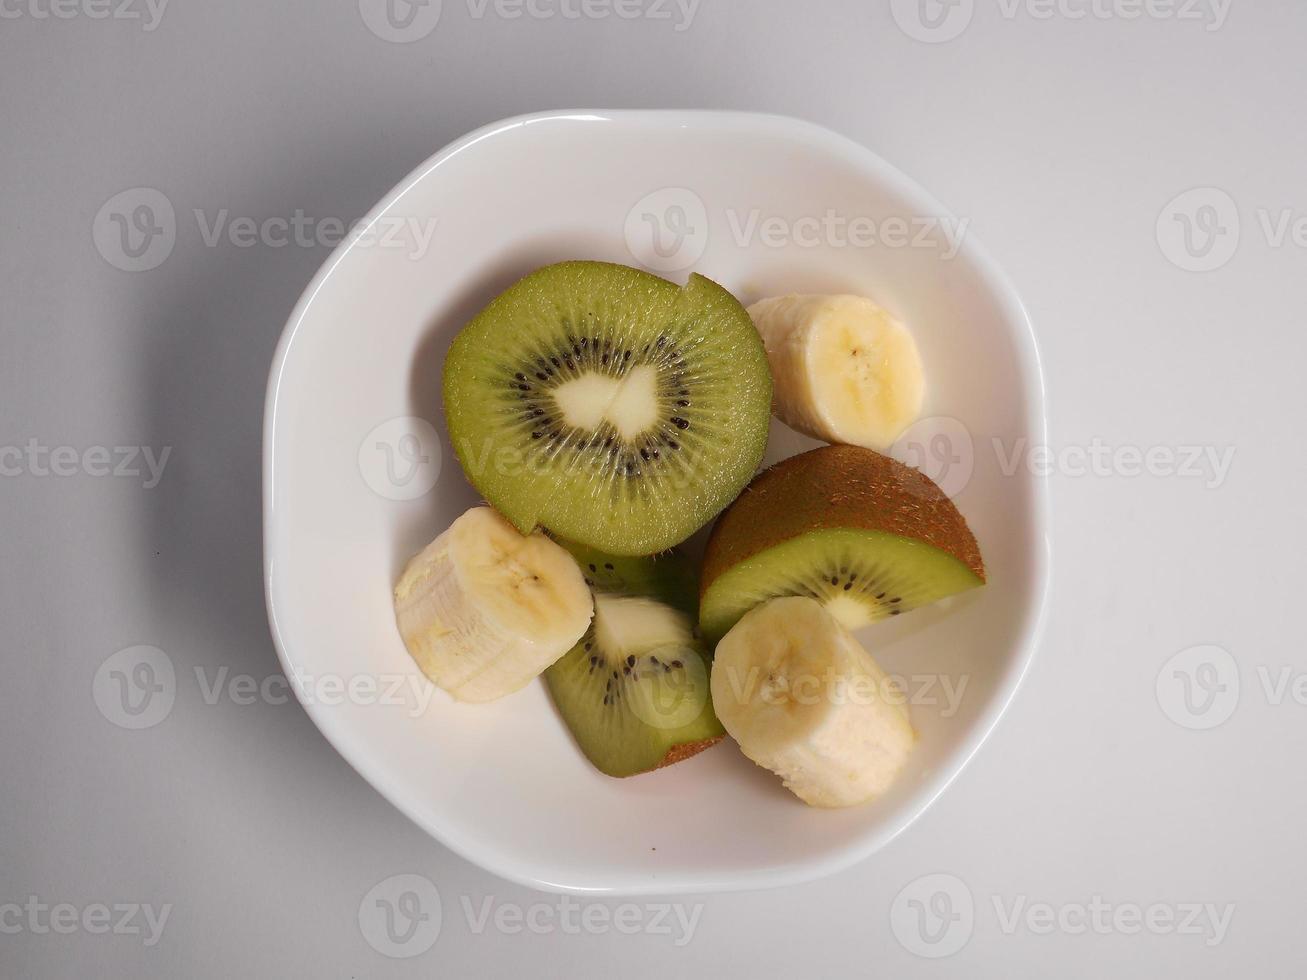 kiwis e banana foto